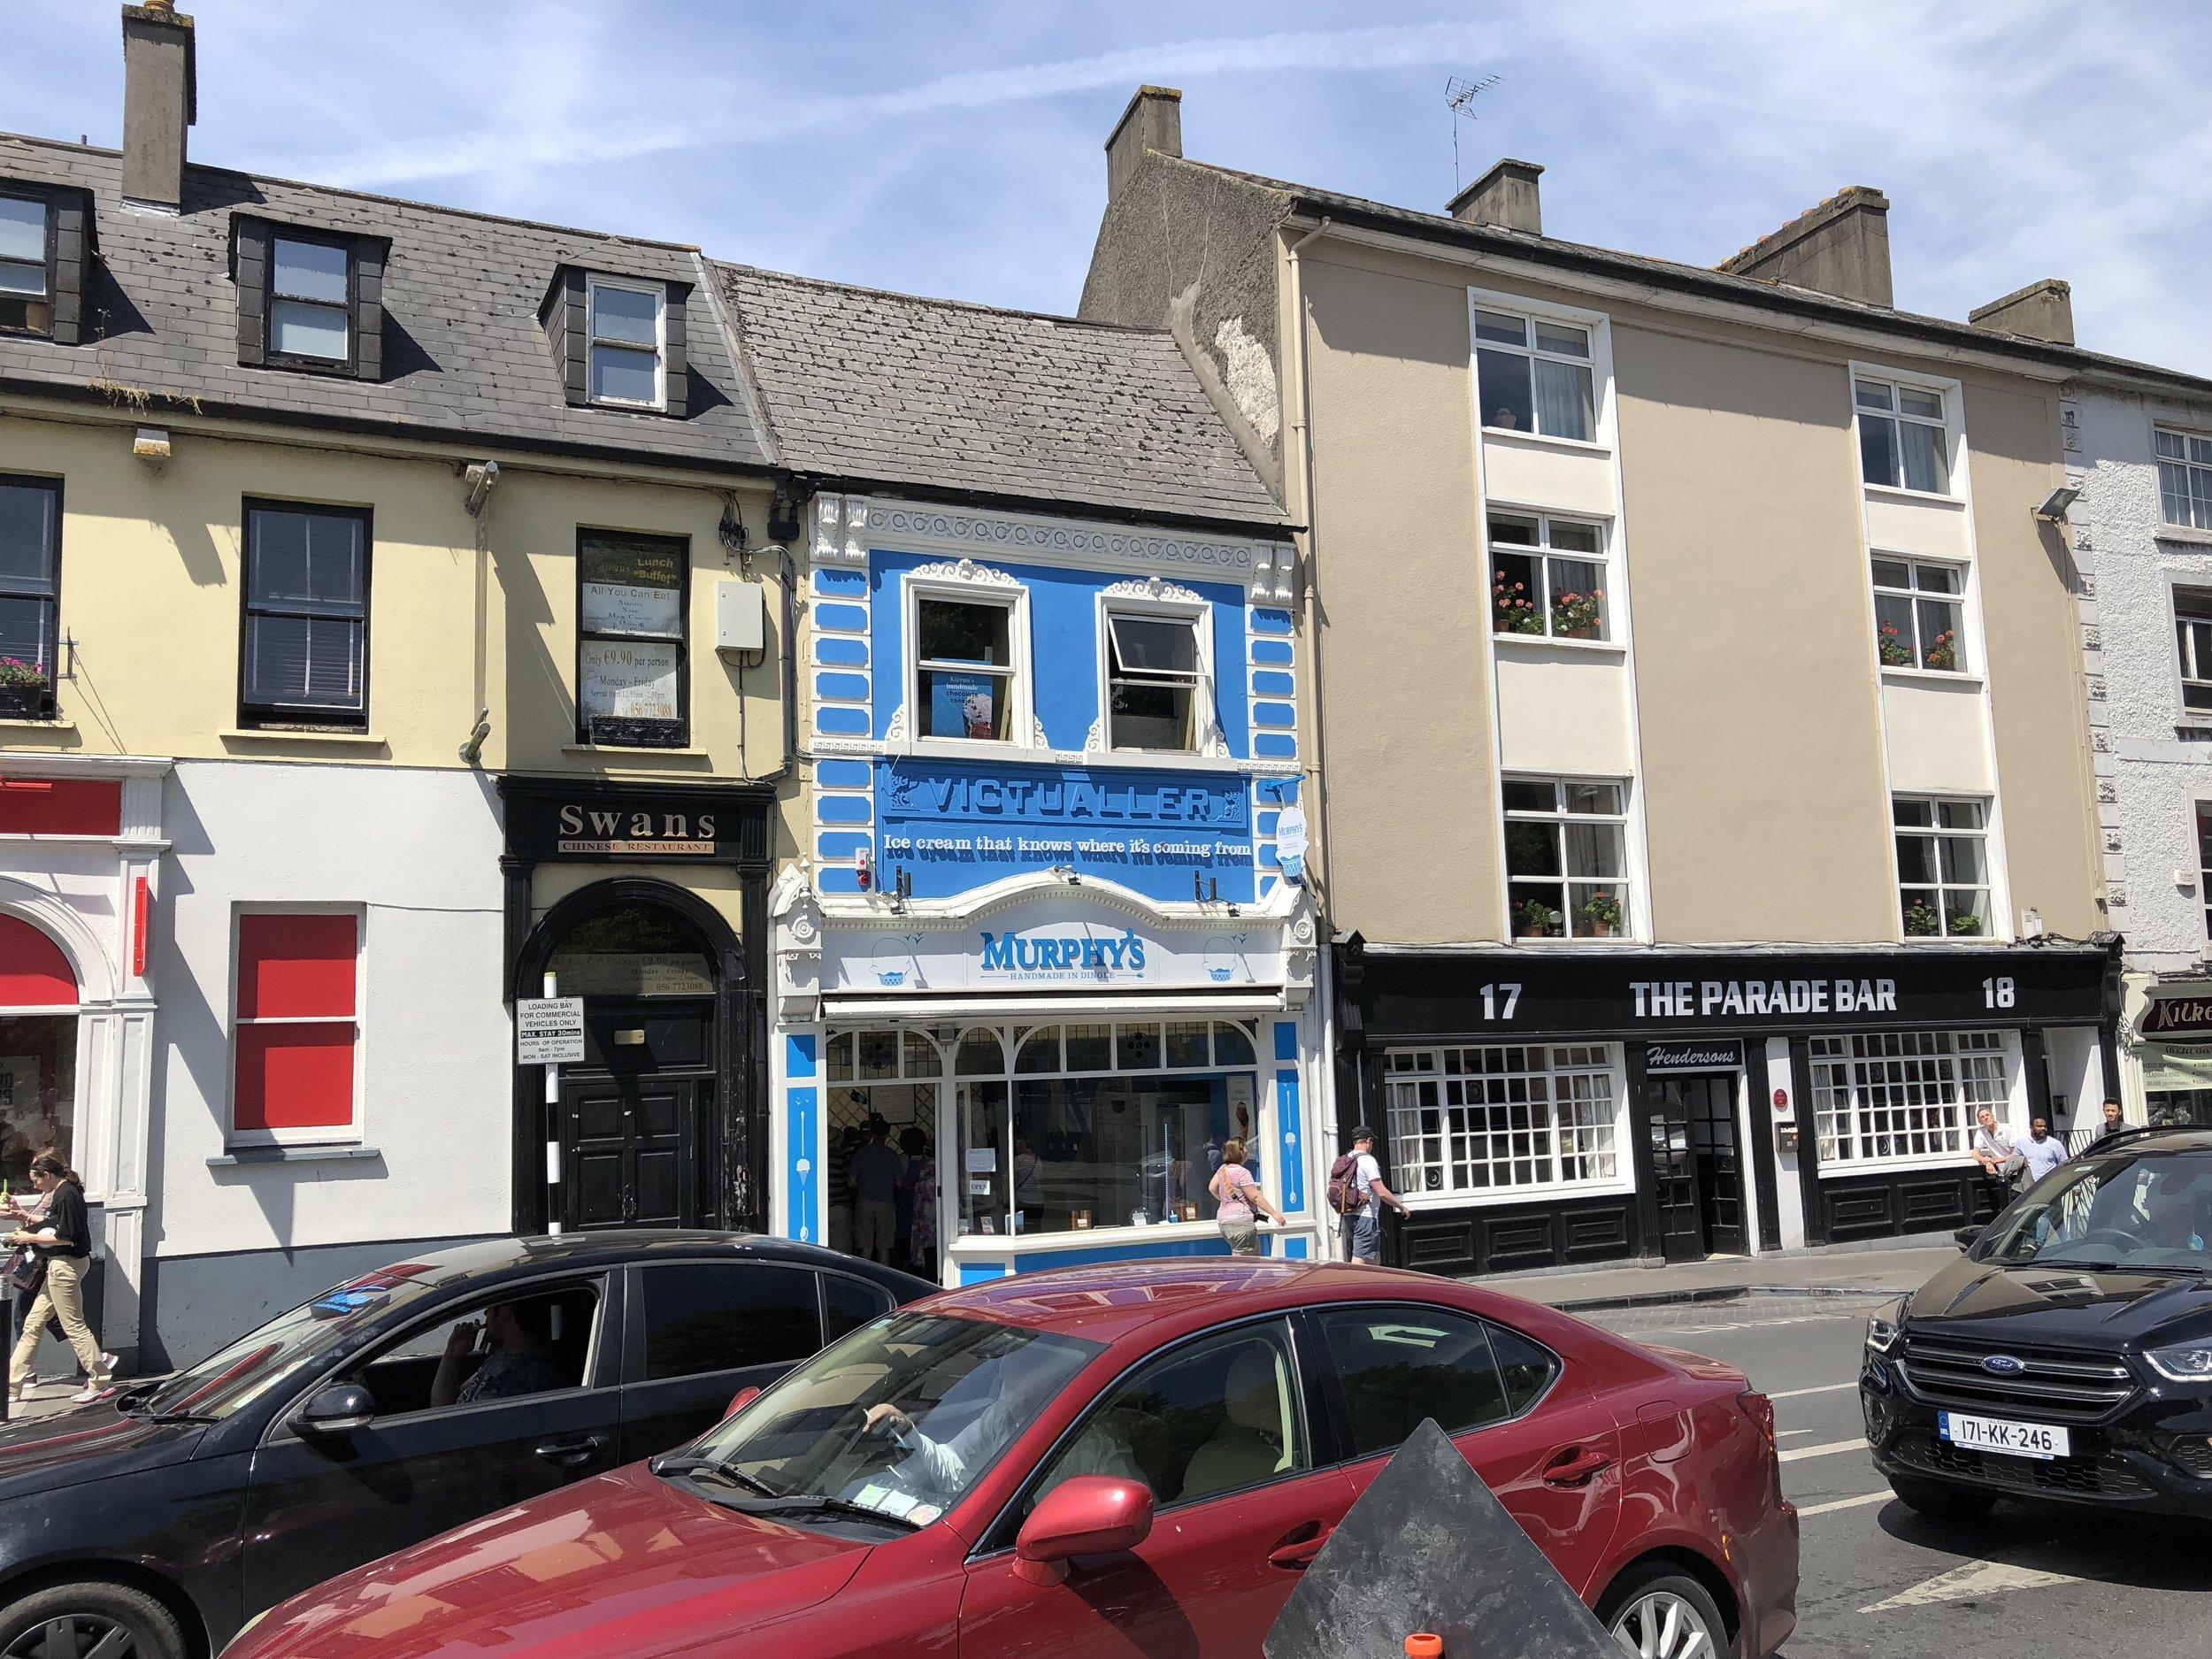 Ice cream allergy eats in Ireland